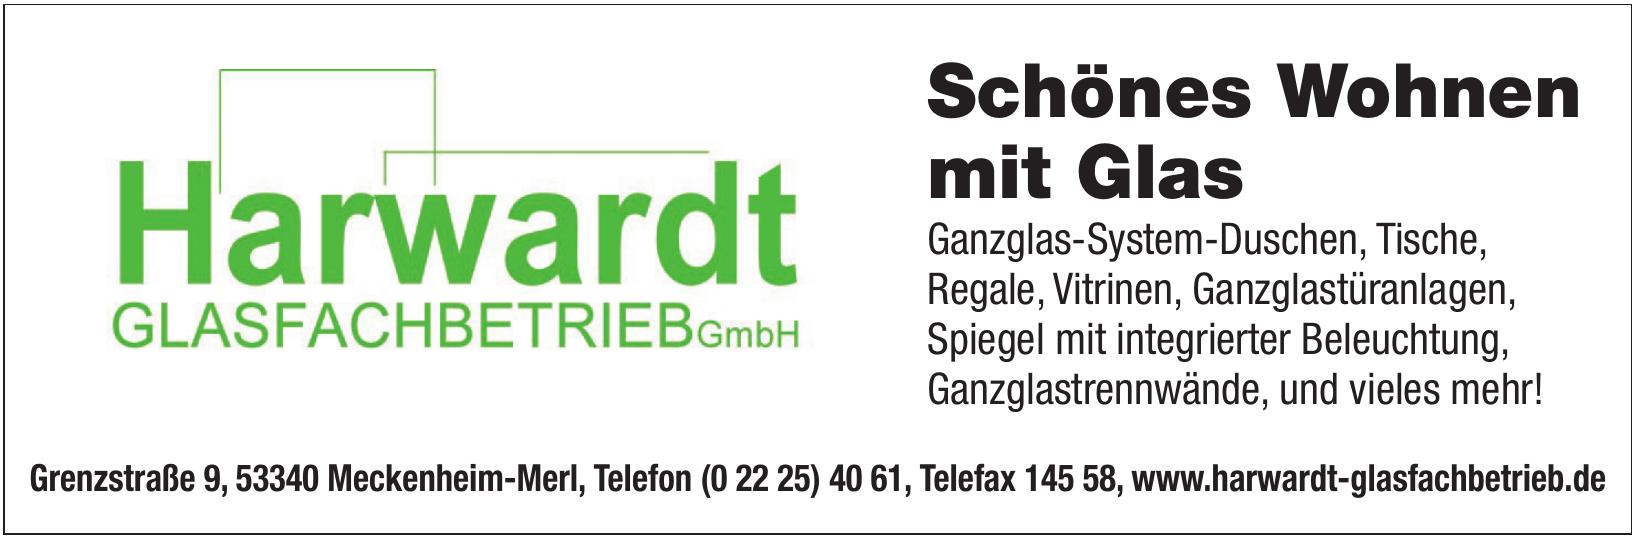 Harwardt Glasfachbetrieb GmbH